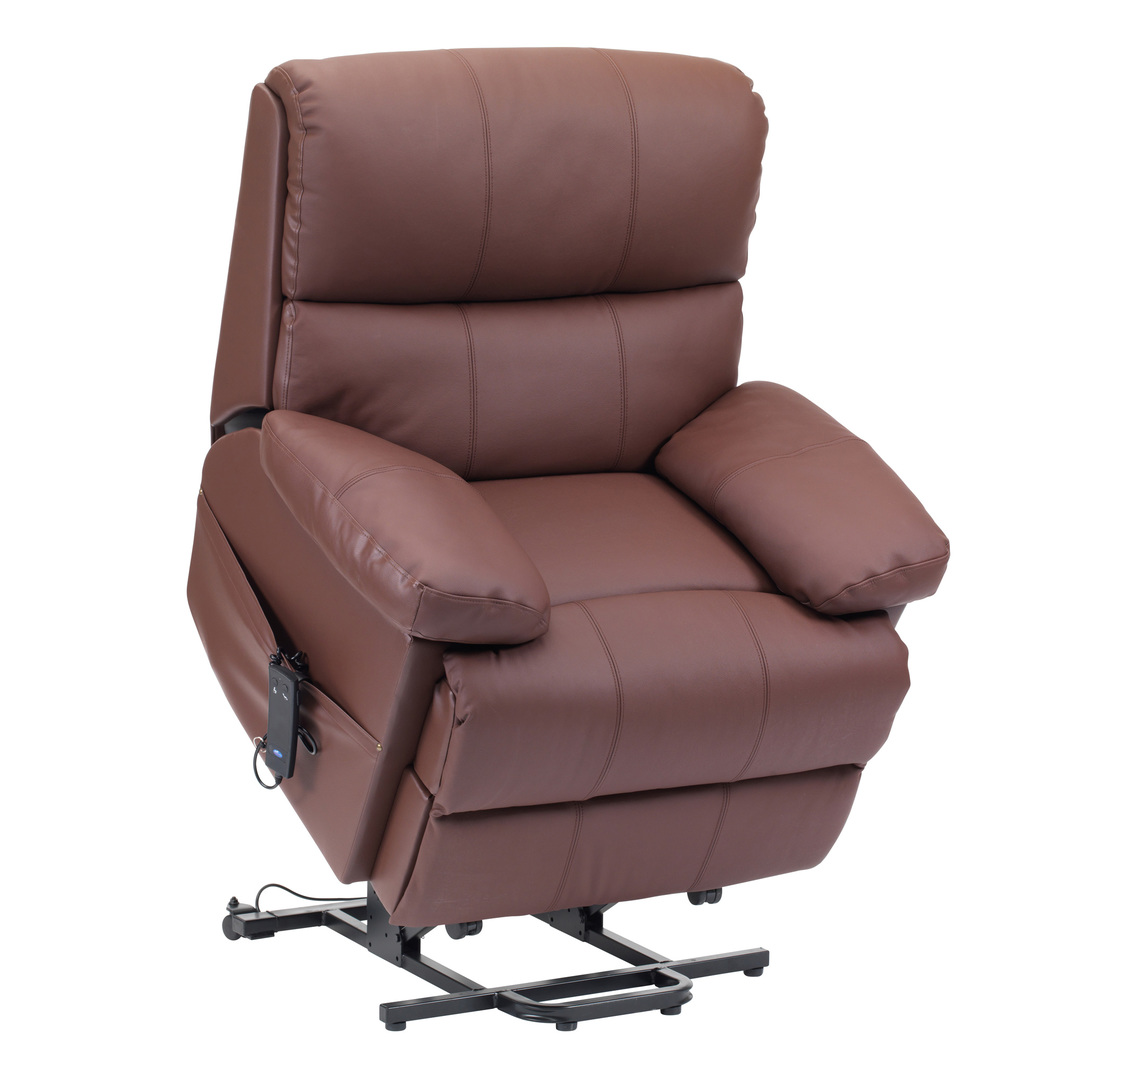 swivel chair risers raz shower uk sven riser recliner world of scooters manchester